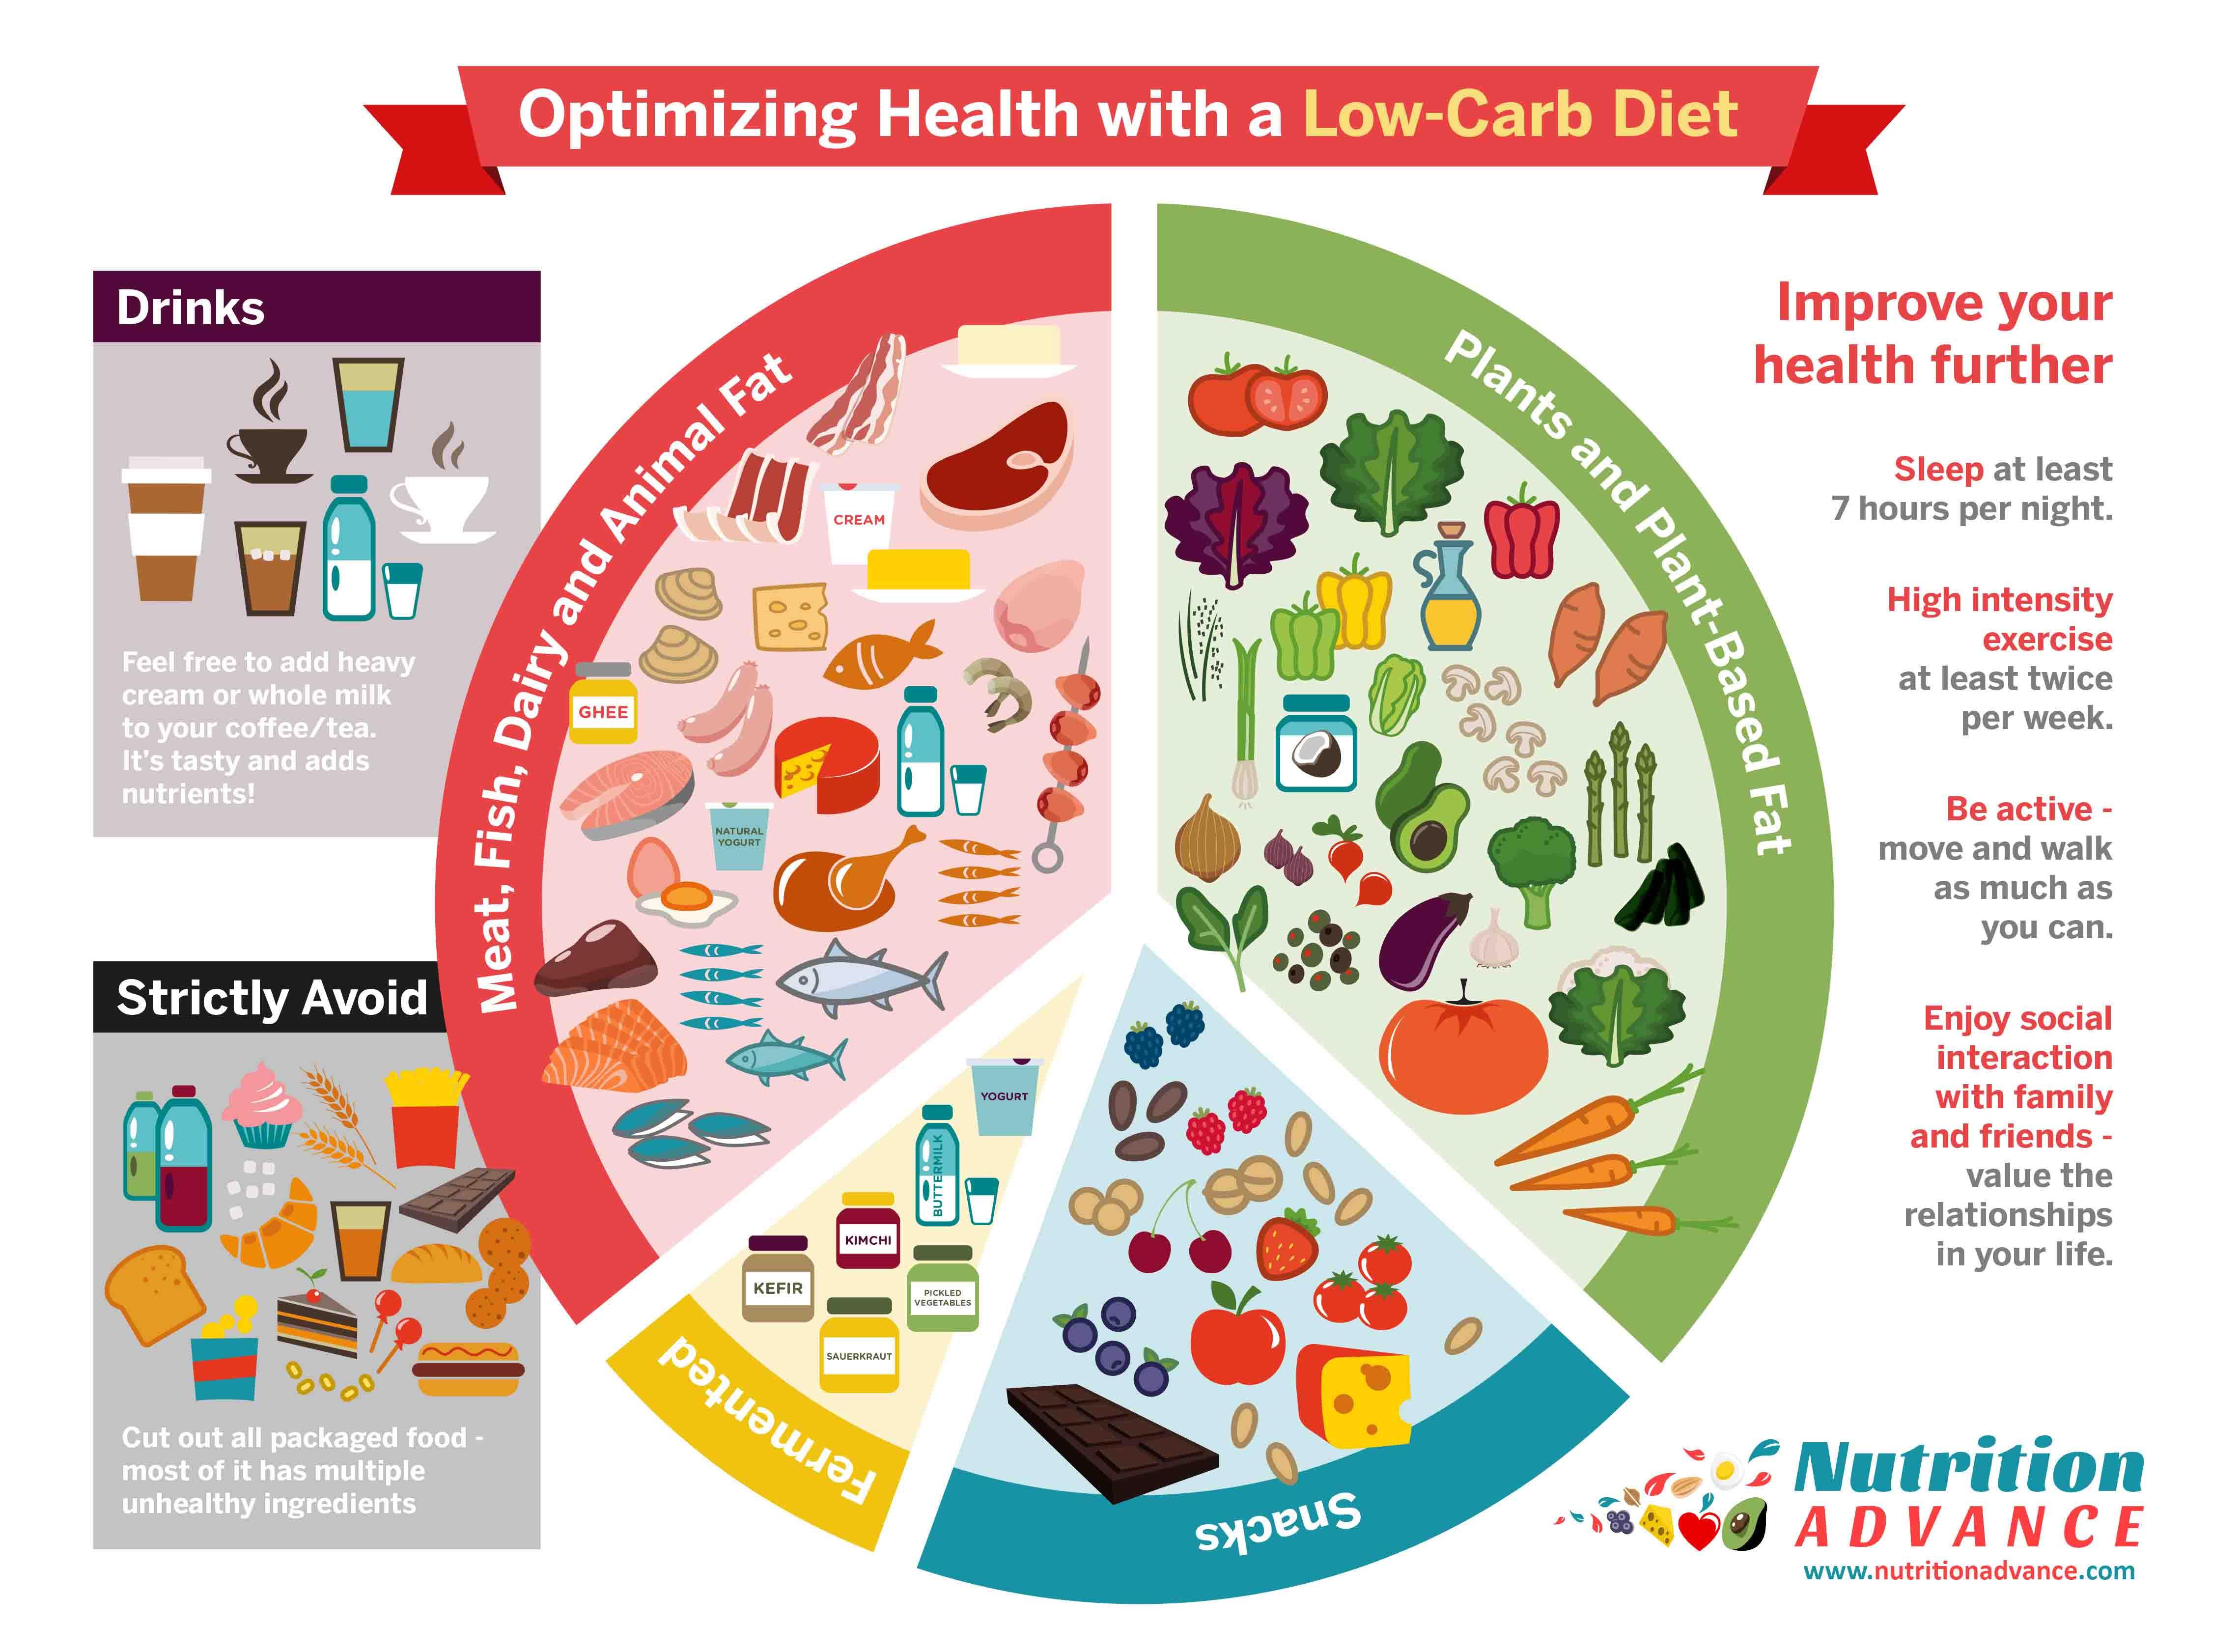 Optimizing-health-low-carb-diet.jpg